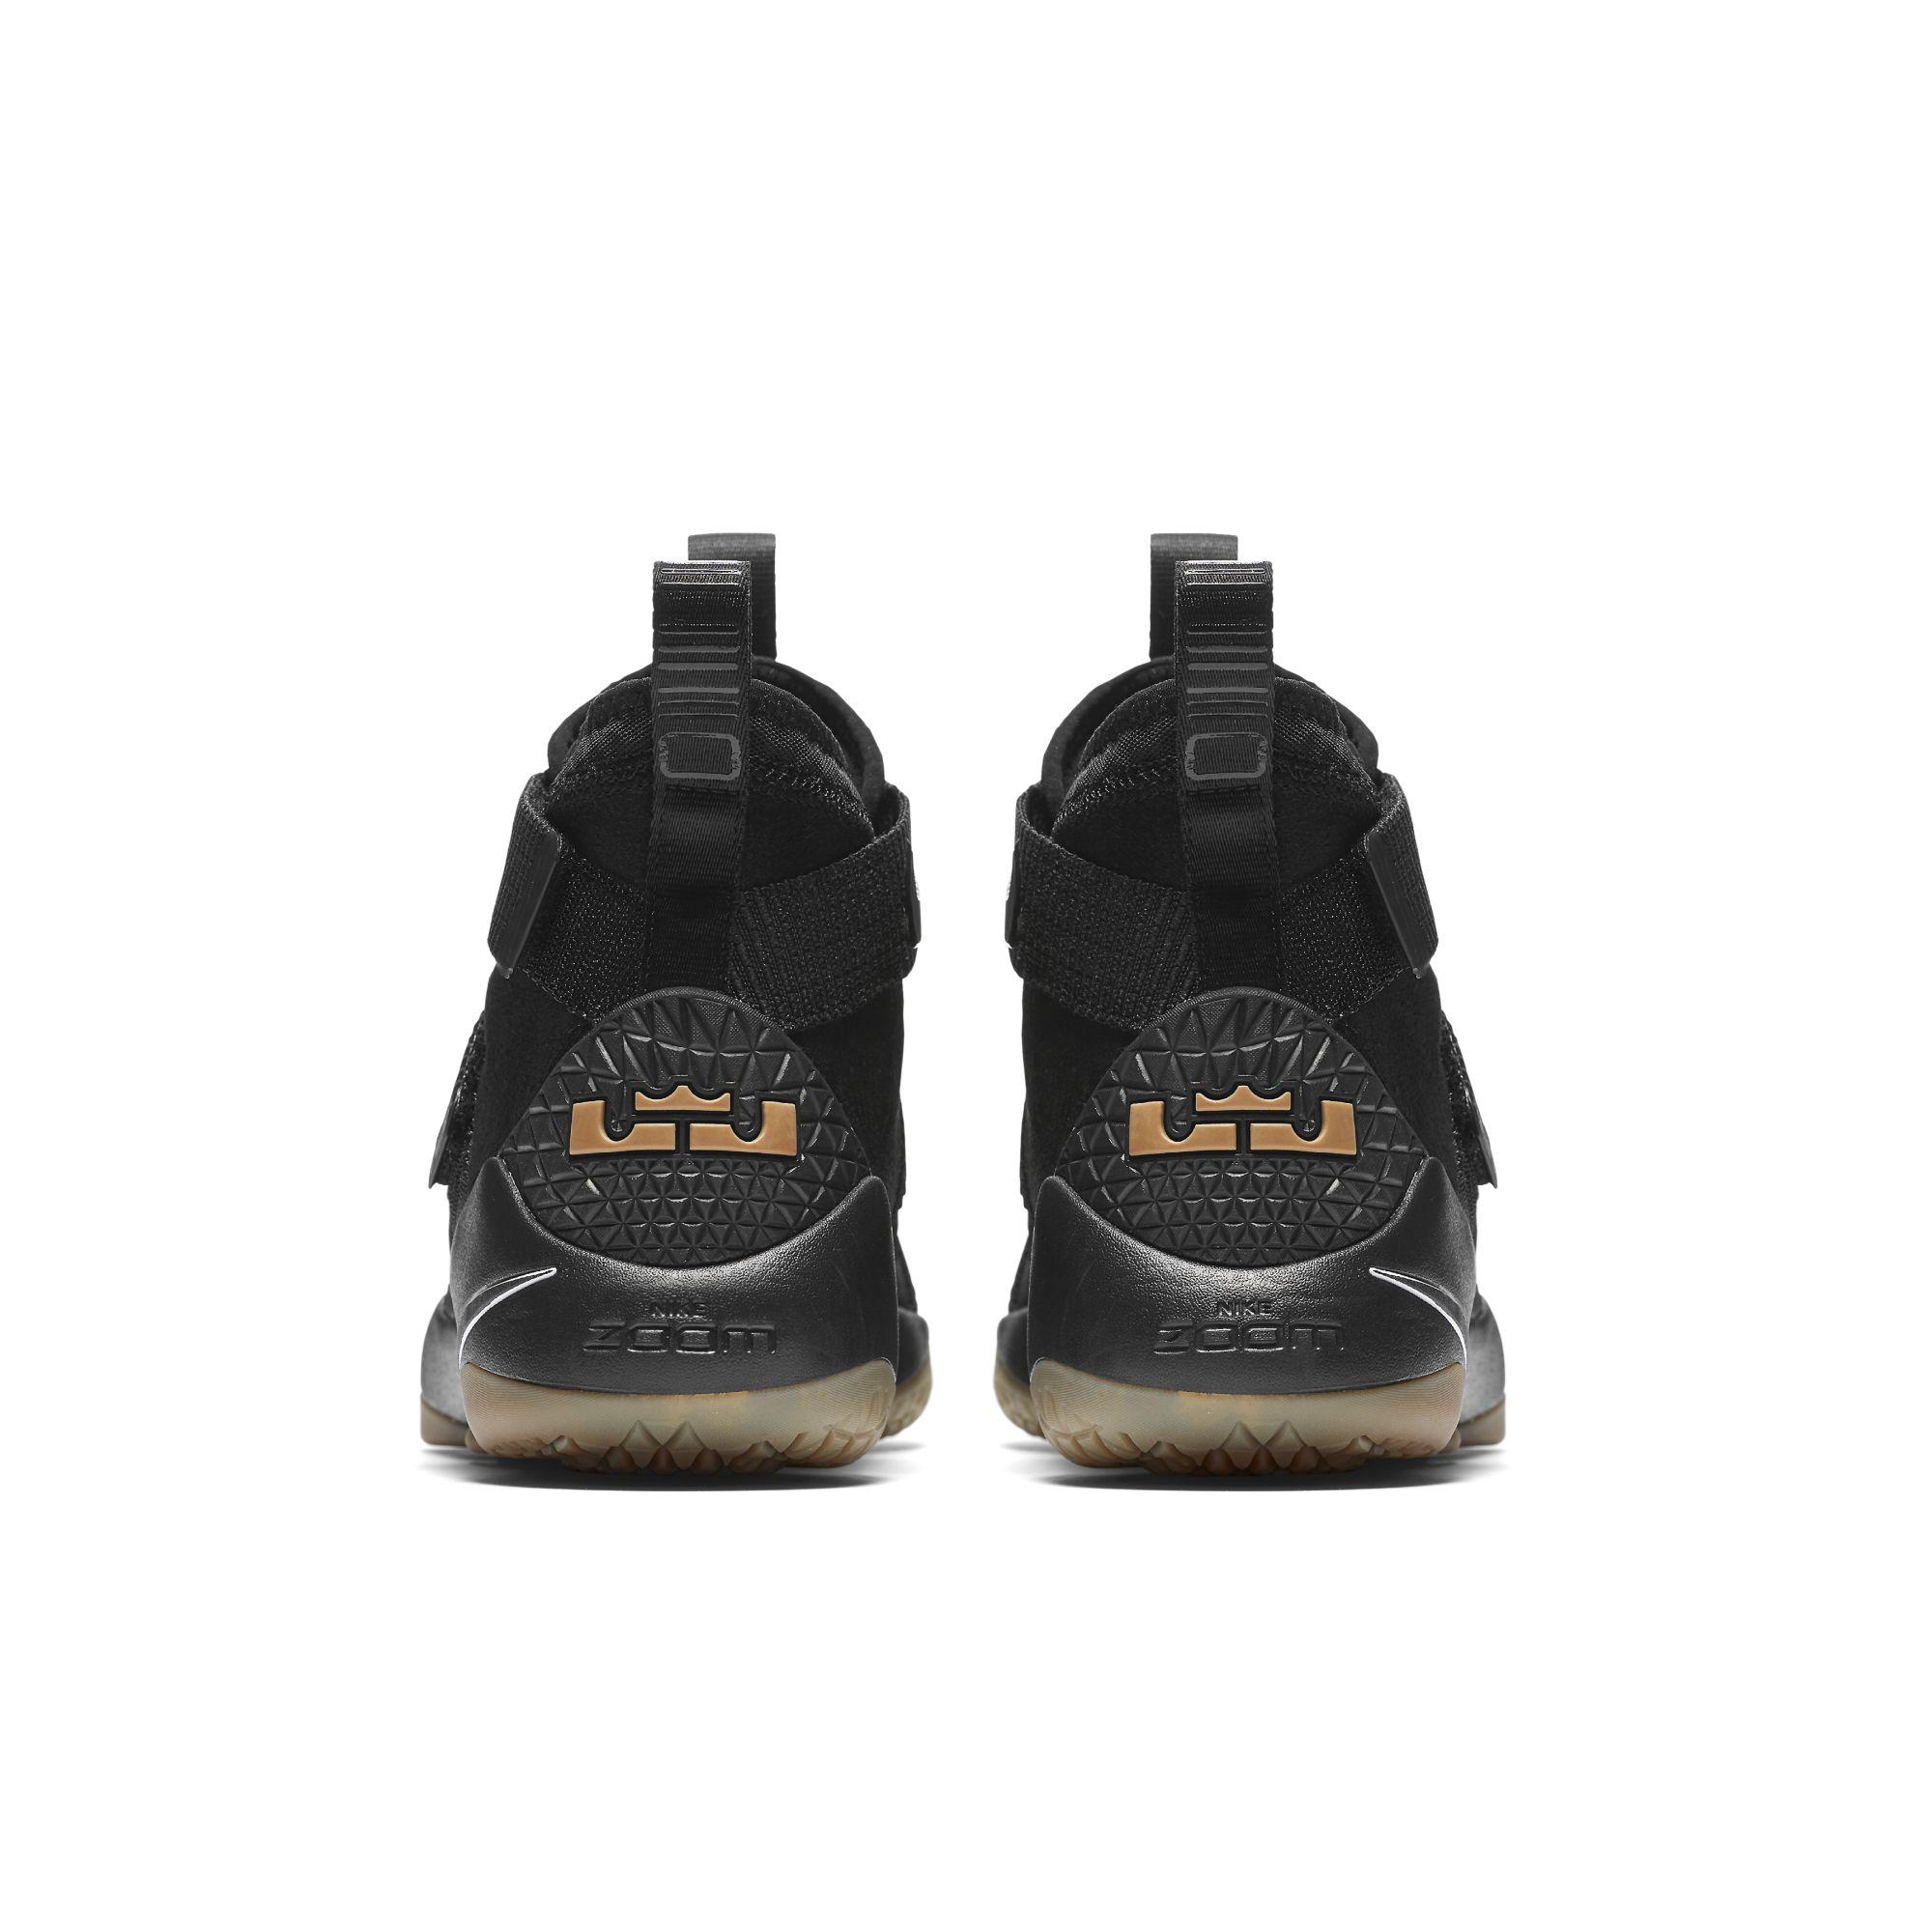 Nike LeBron Soldier 11 Black/Gum